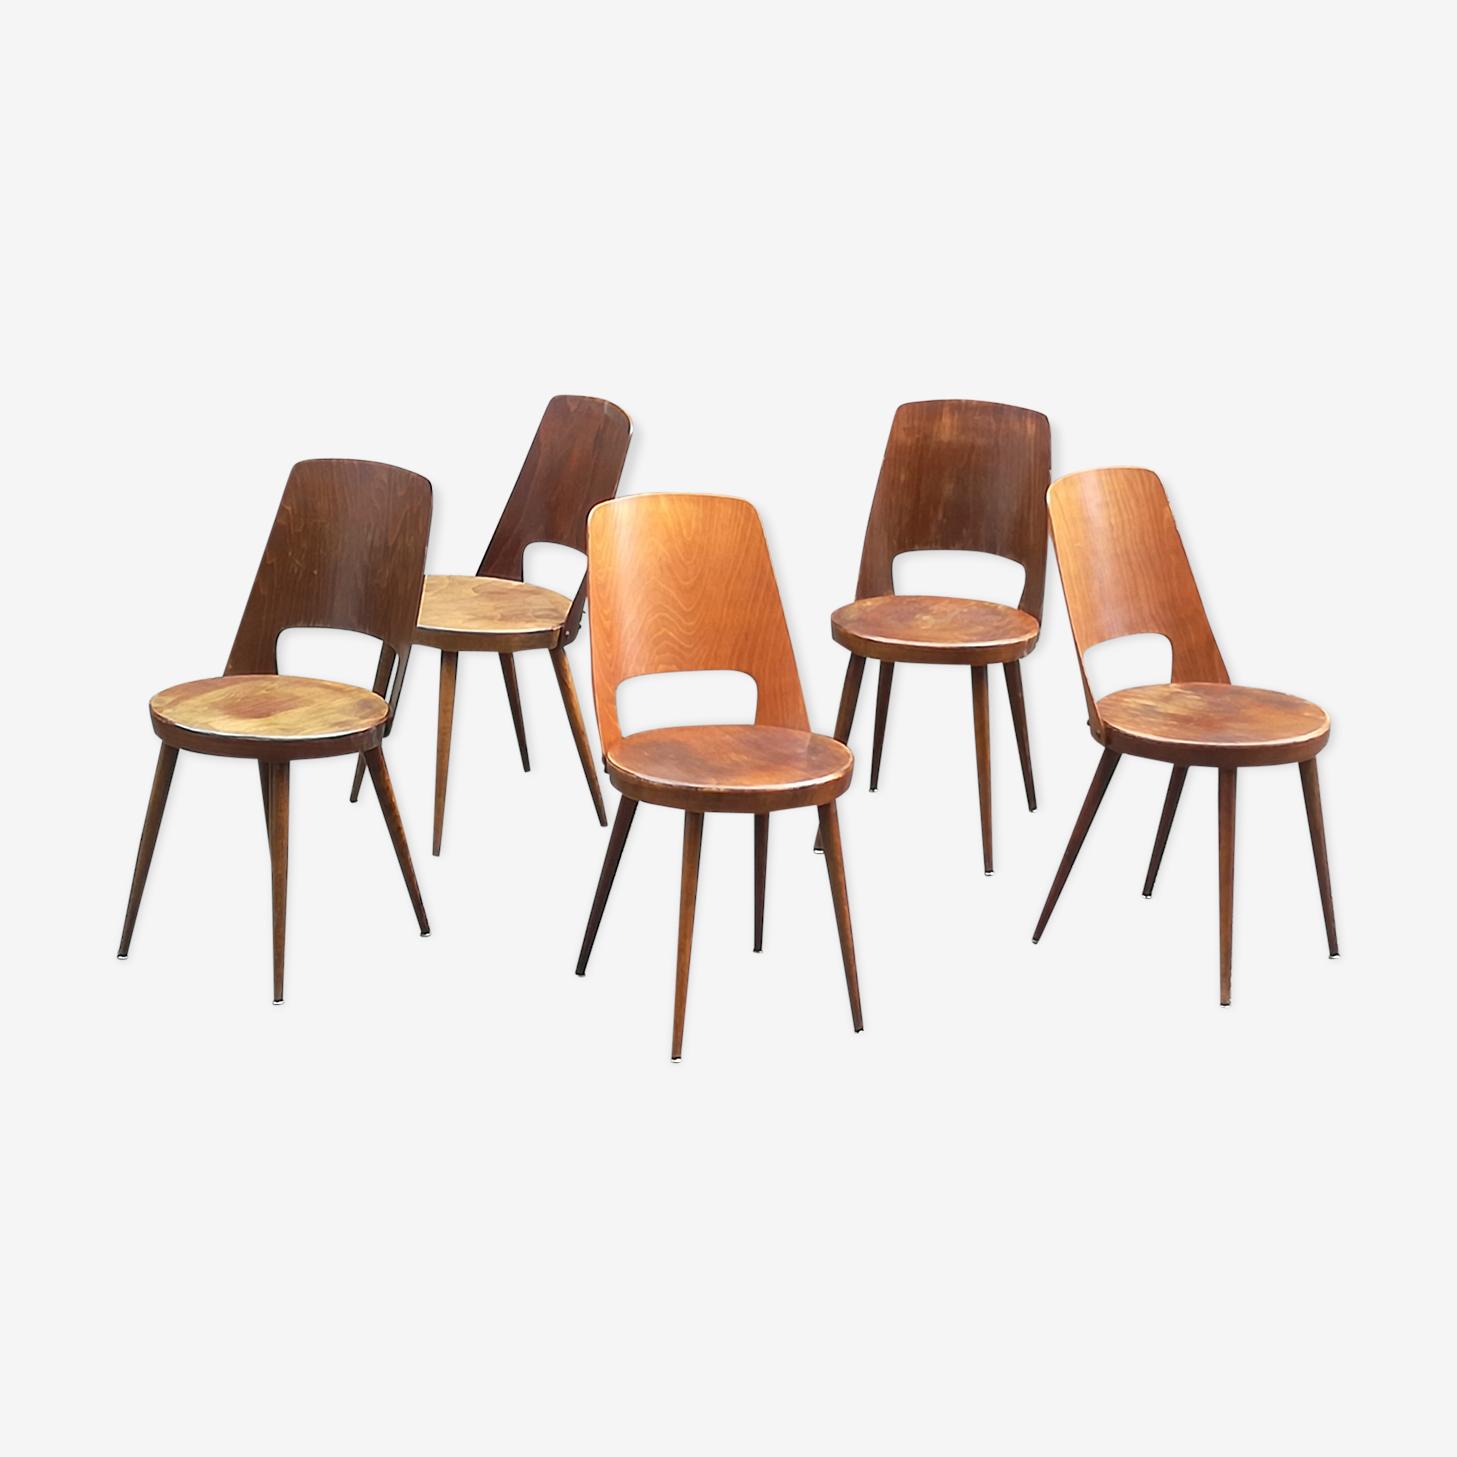 5 bistro chairs Baumann Mondor